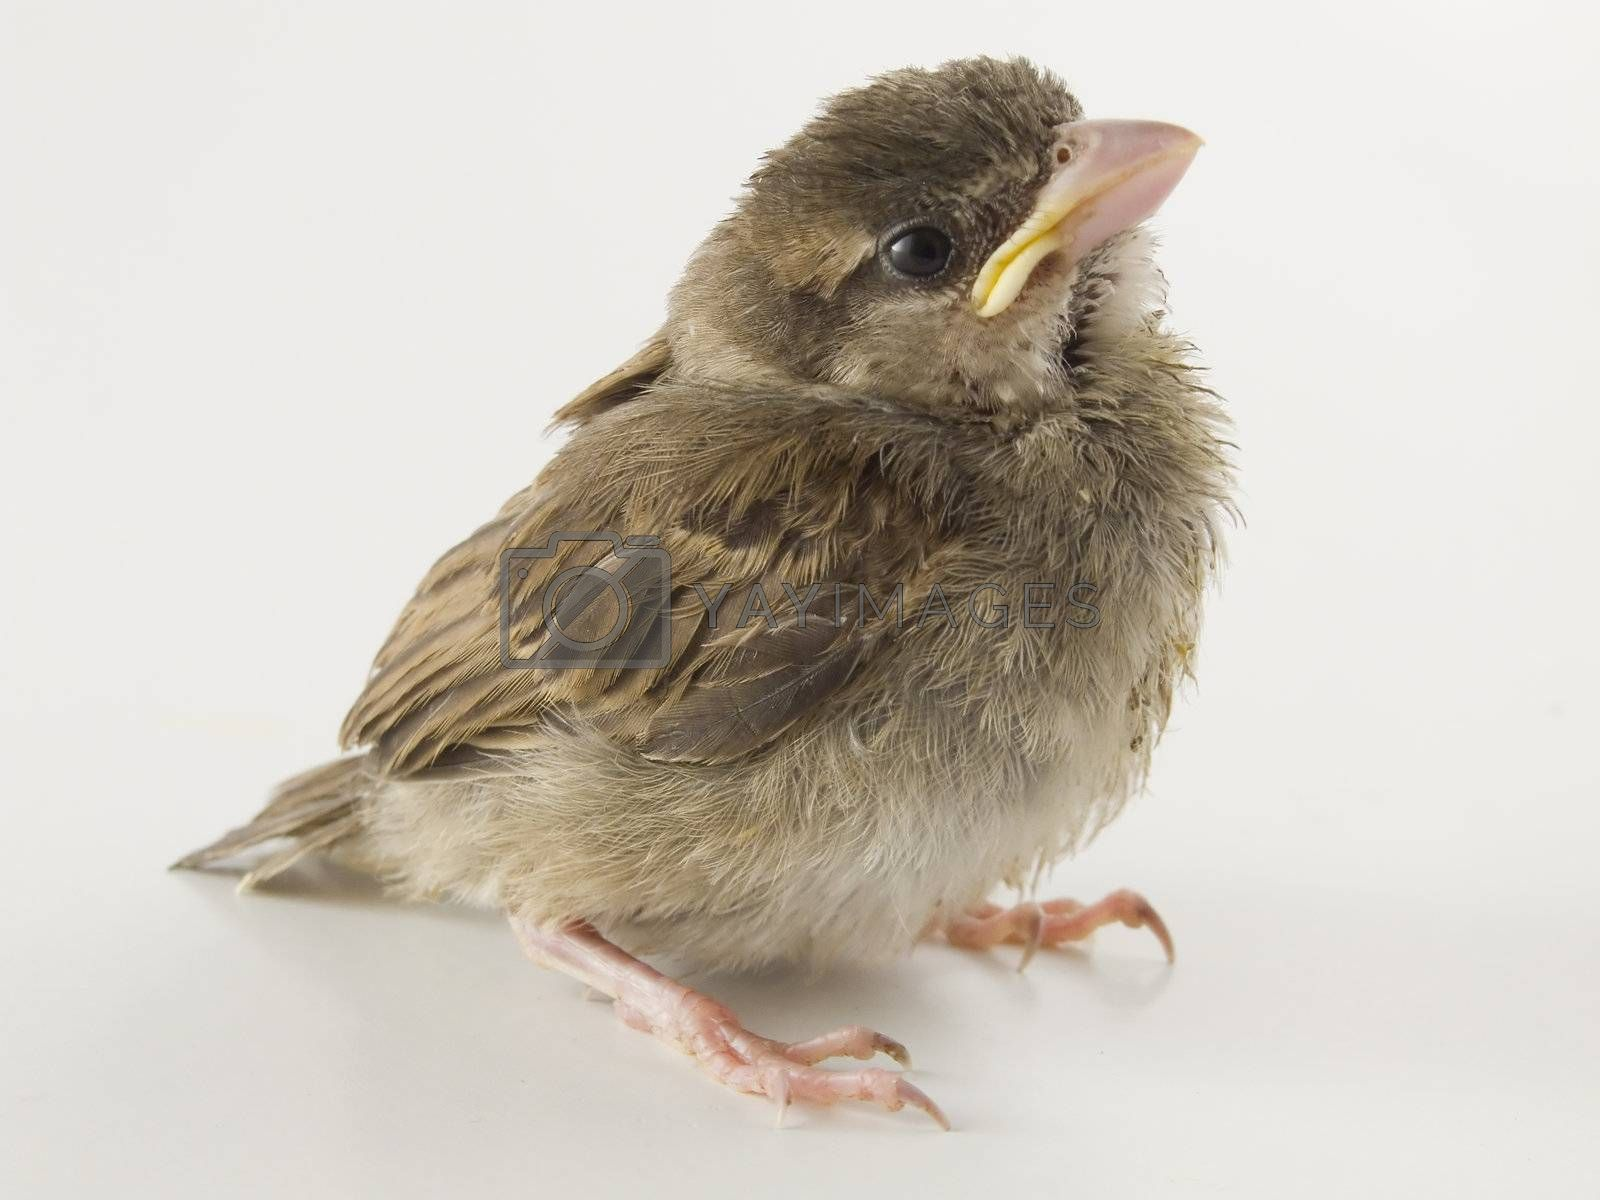 sparrow by PauloResende